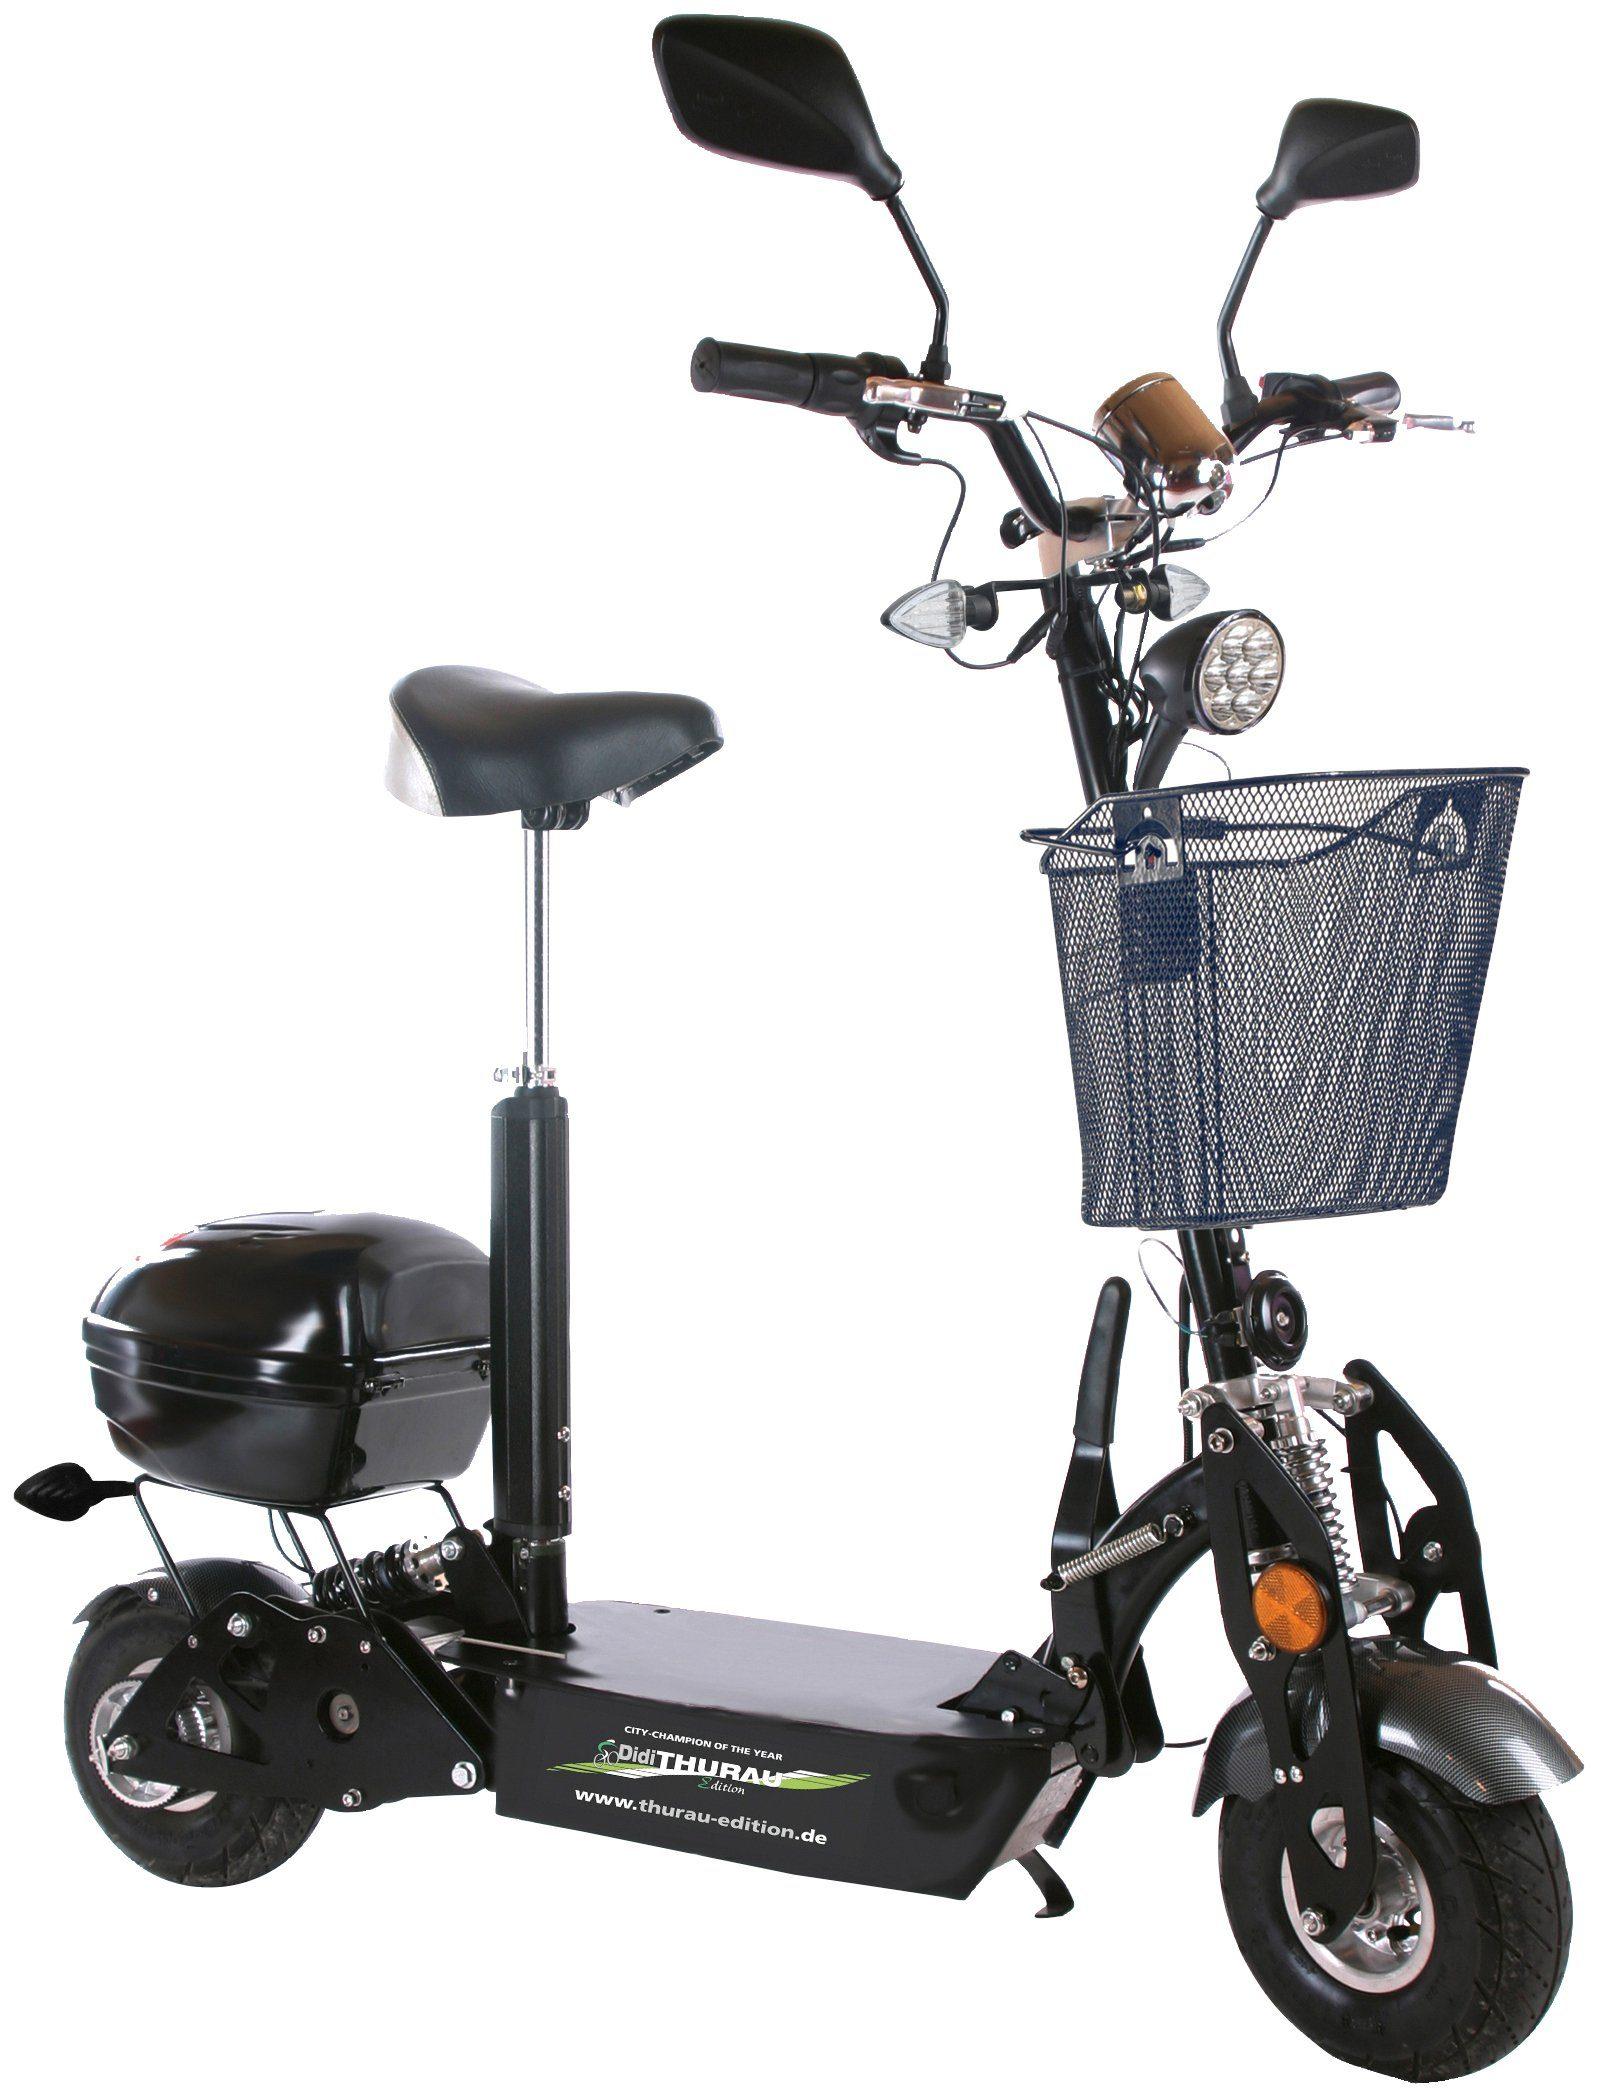 DIDI THURAU E-Scooter »City Roller Safety Plus RSP«, 20 km/h, Inkl. Rundum-Sorglos-Paket